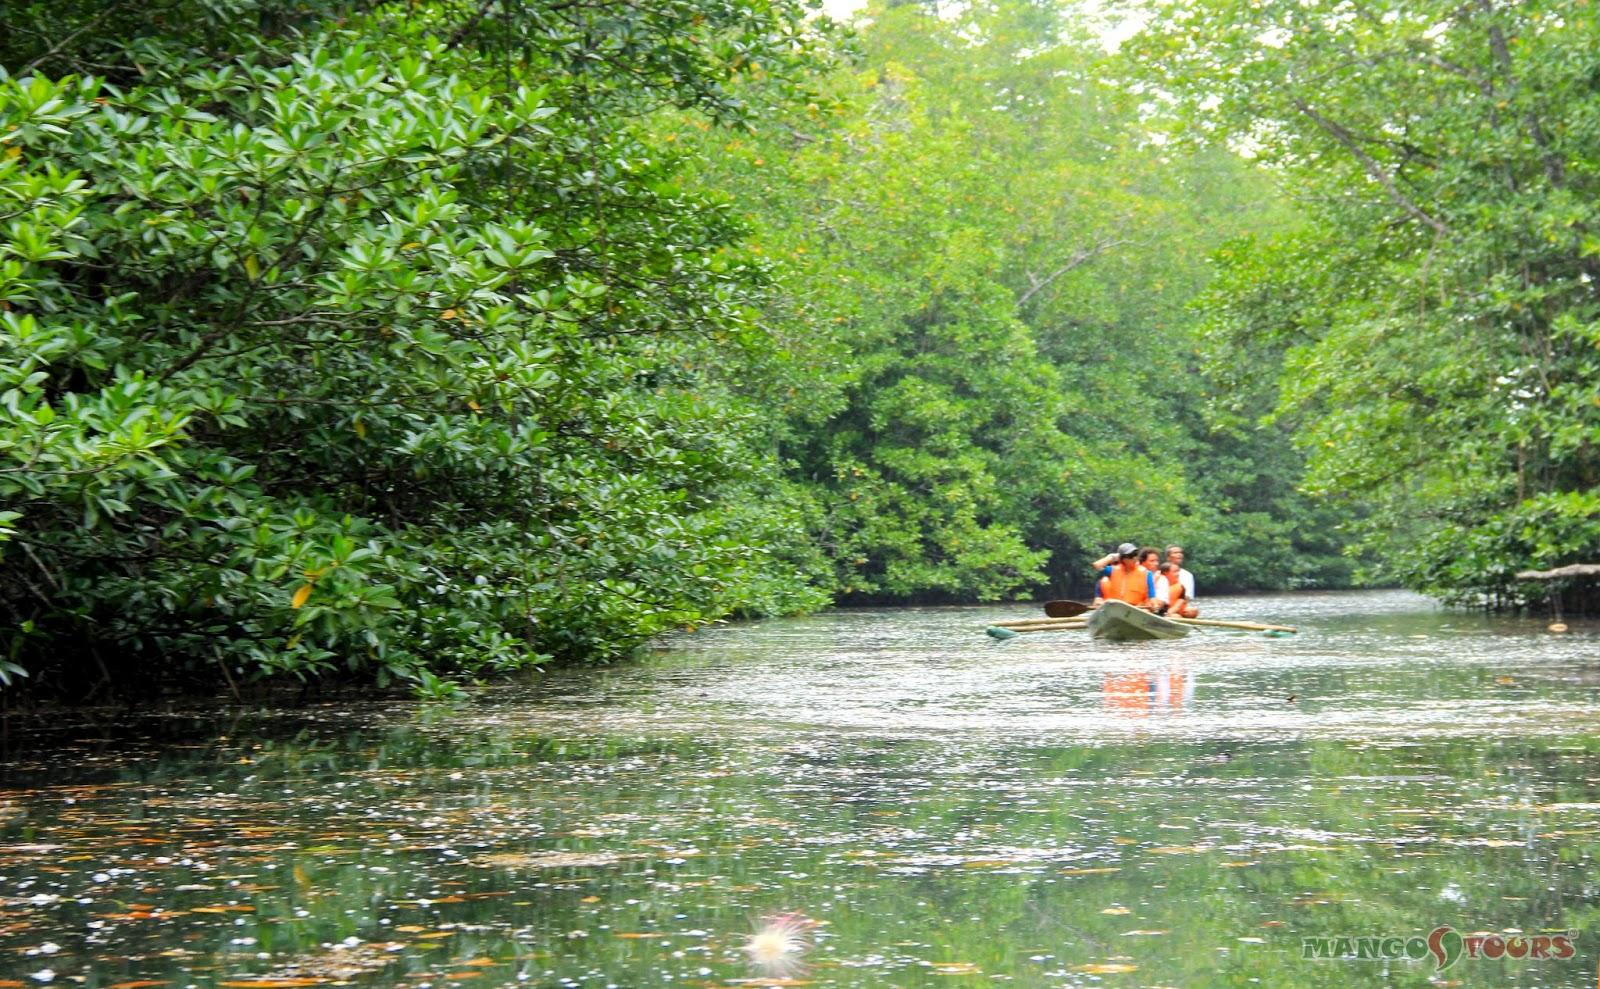 Mango Tours Puerto Princesa Palawan Mangrove Paddle Boat Tour